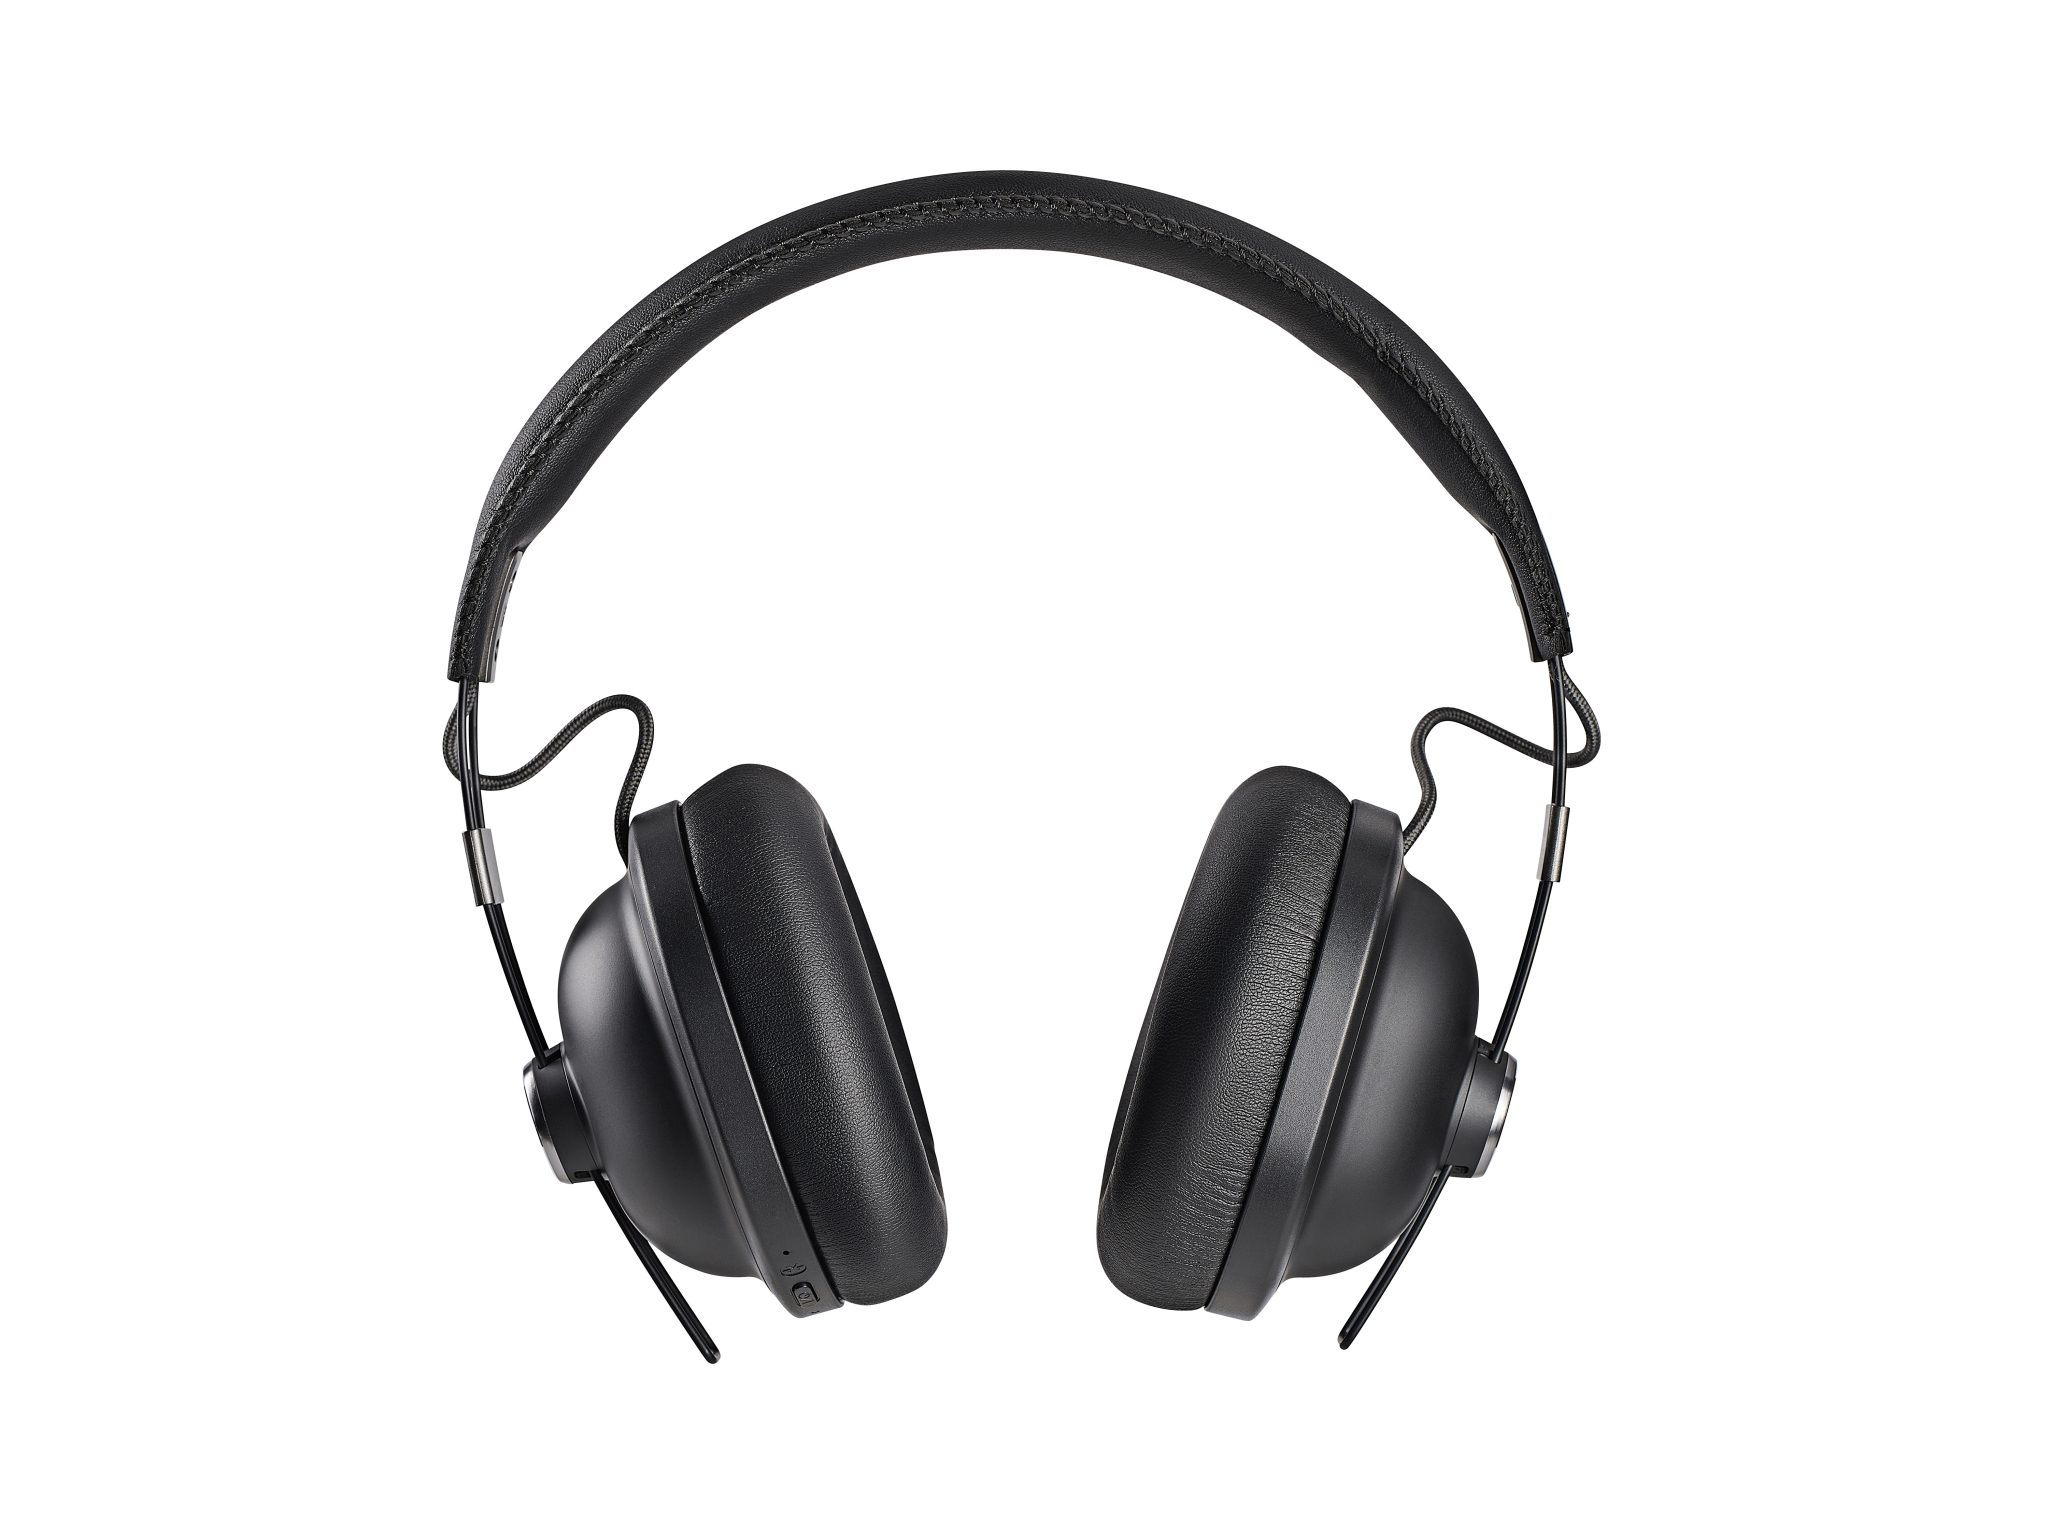 Nota de Prensa - Panasonic HTX90, los auriculares de tendencia retro con lo último en Noise Cancelling